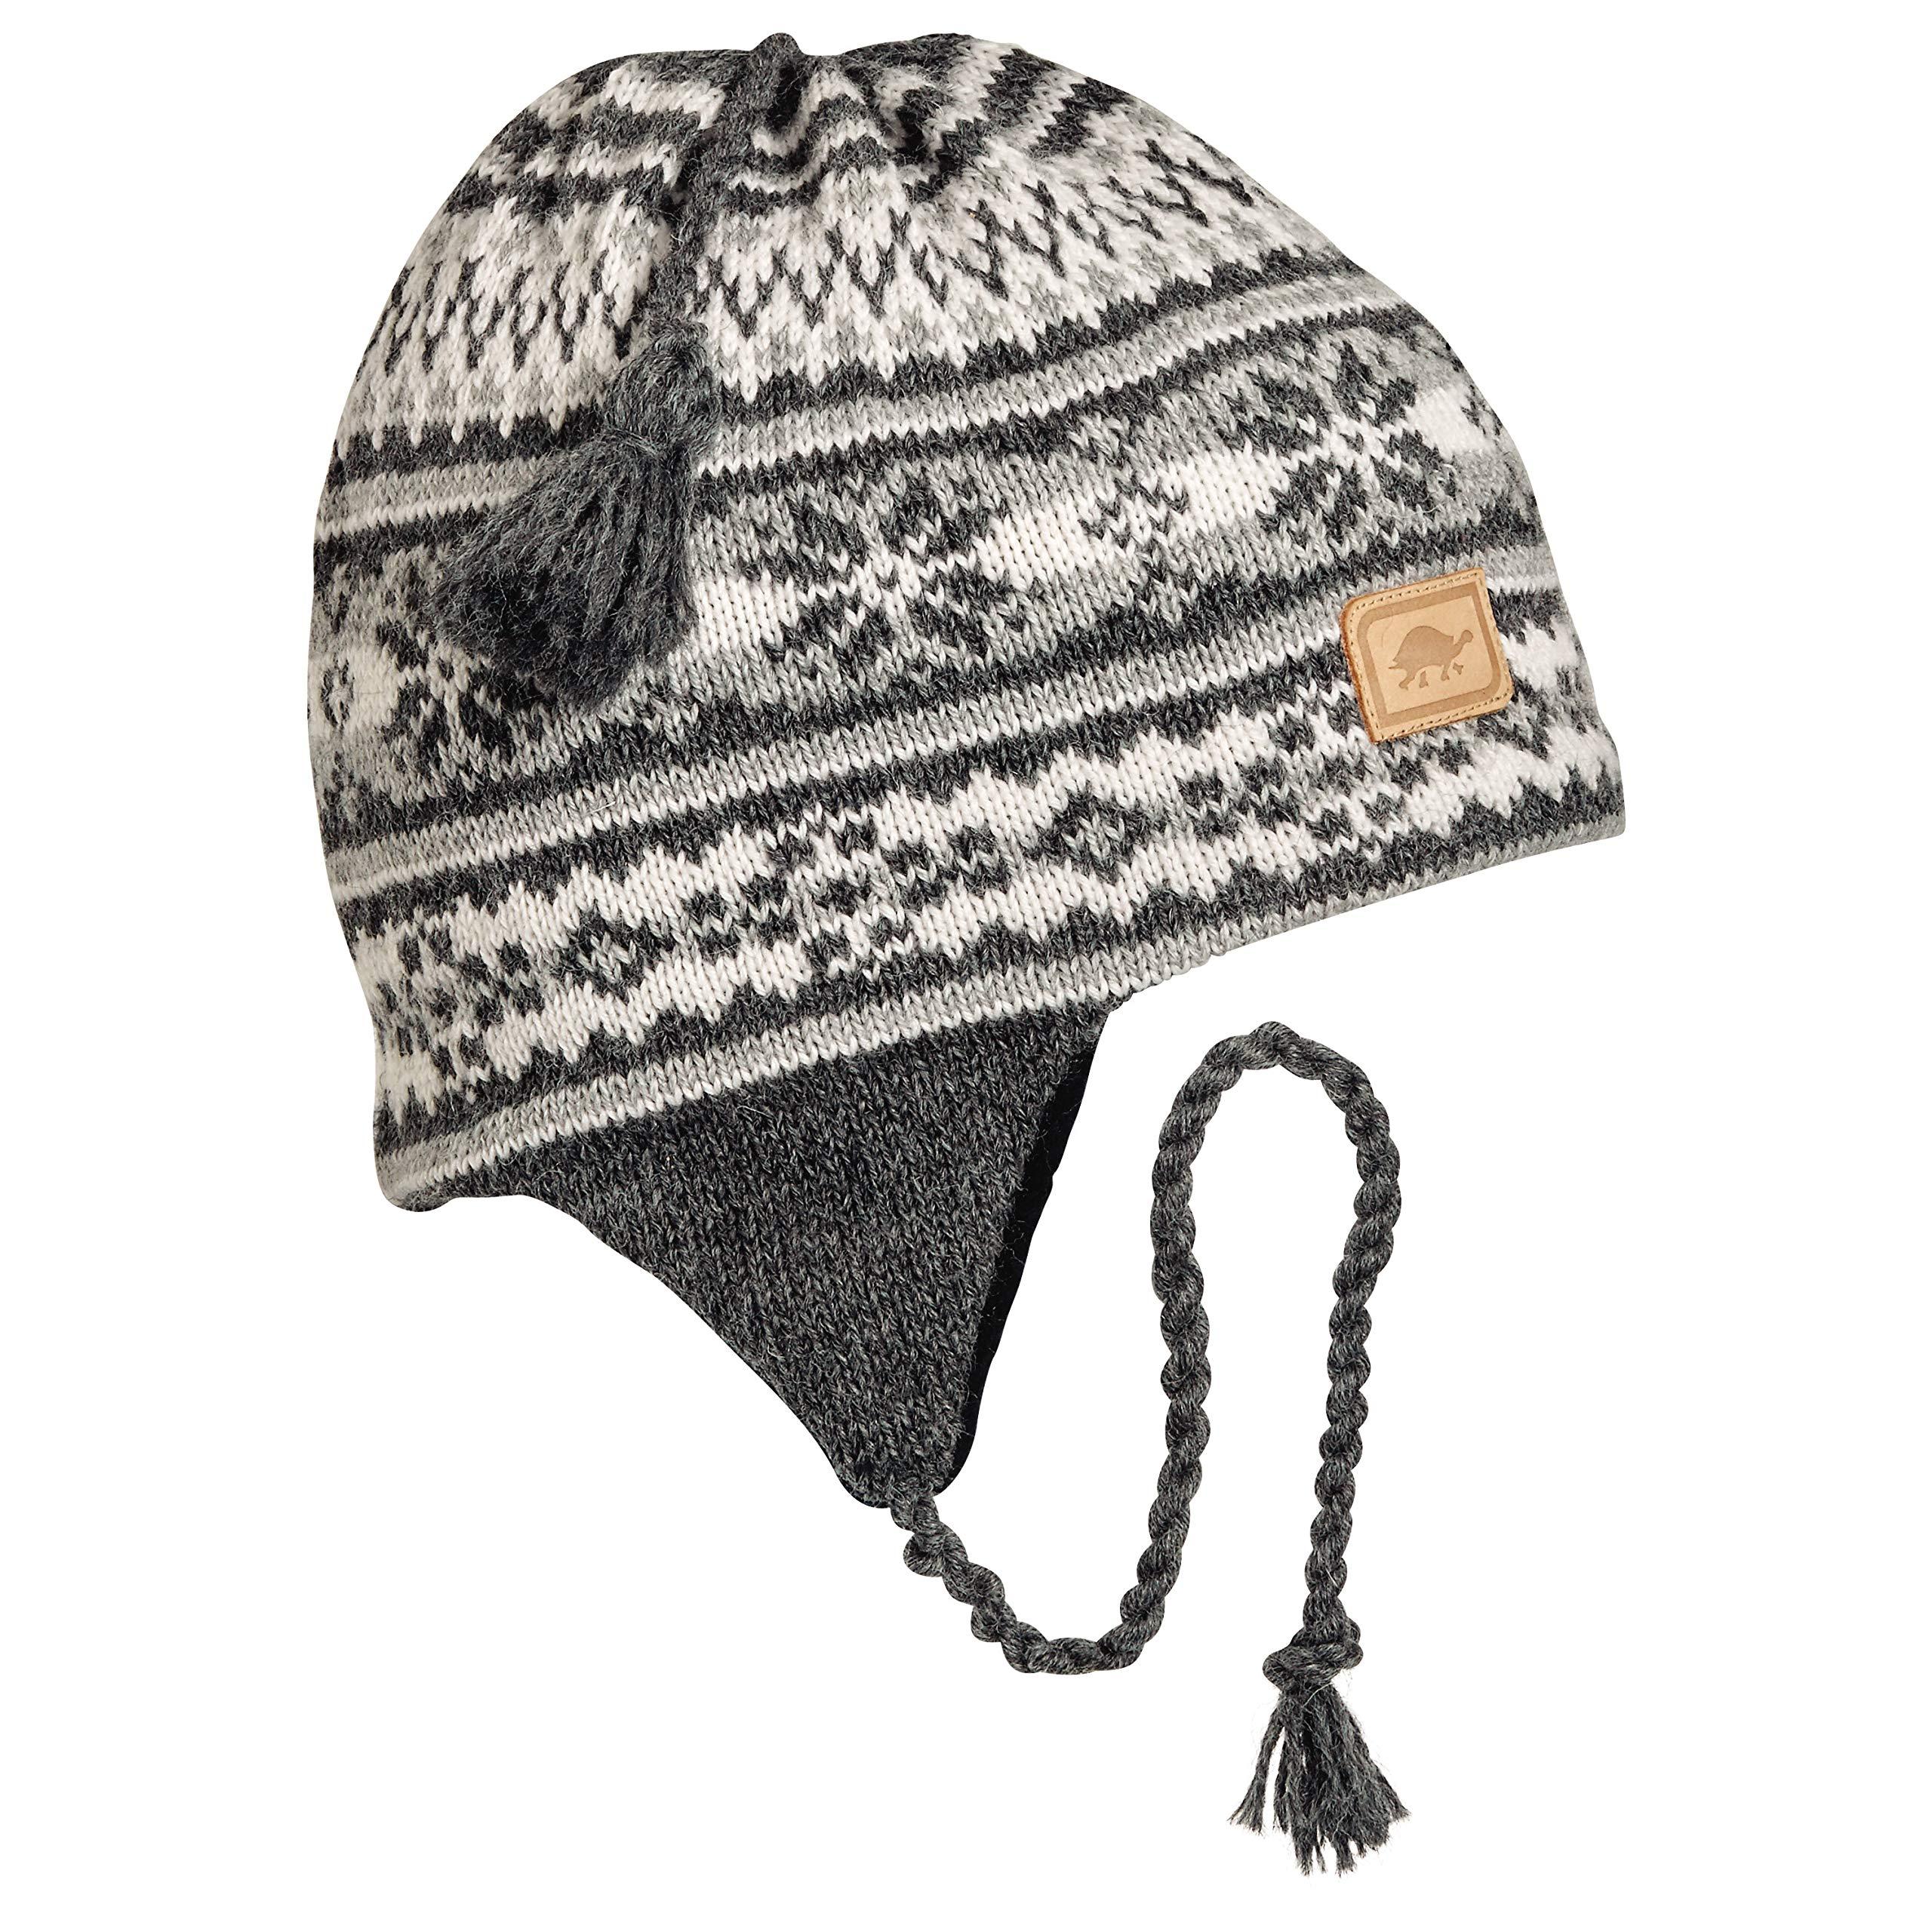 Turtle Fur Women's Nighthorse, Classic Wool Ski Earflap Hat, Charcoal Heather by Turtle Fur (Image #1)